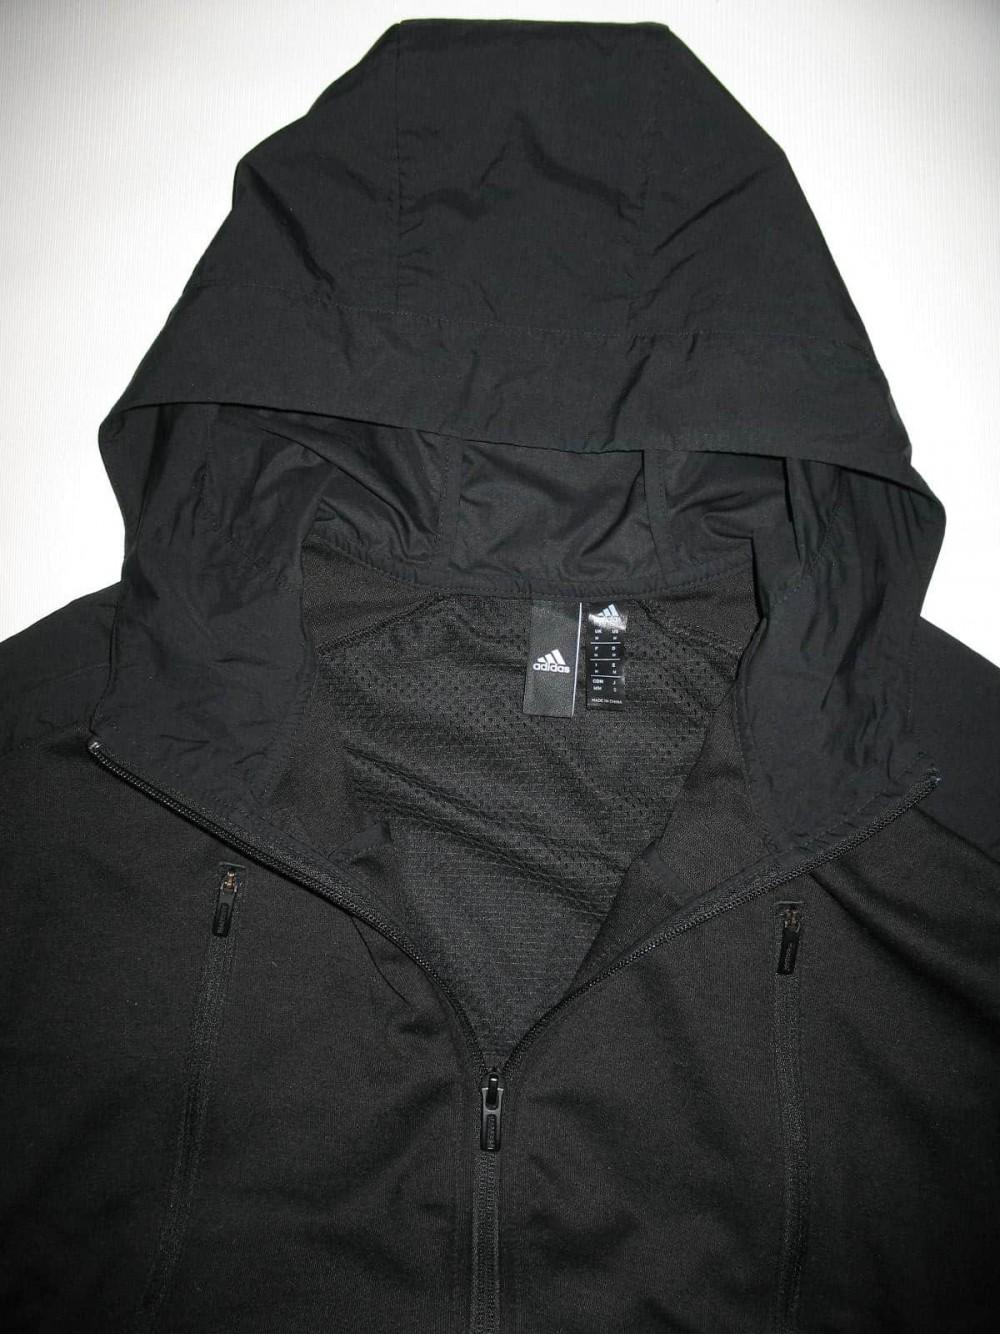 Куртка ADIDAS id hybrid jacket (размер M) - 3